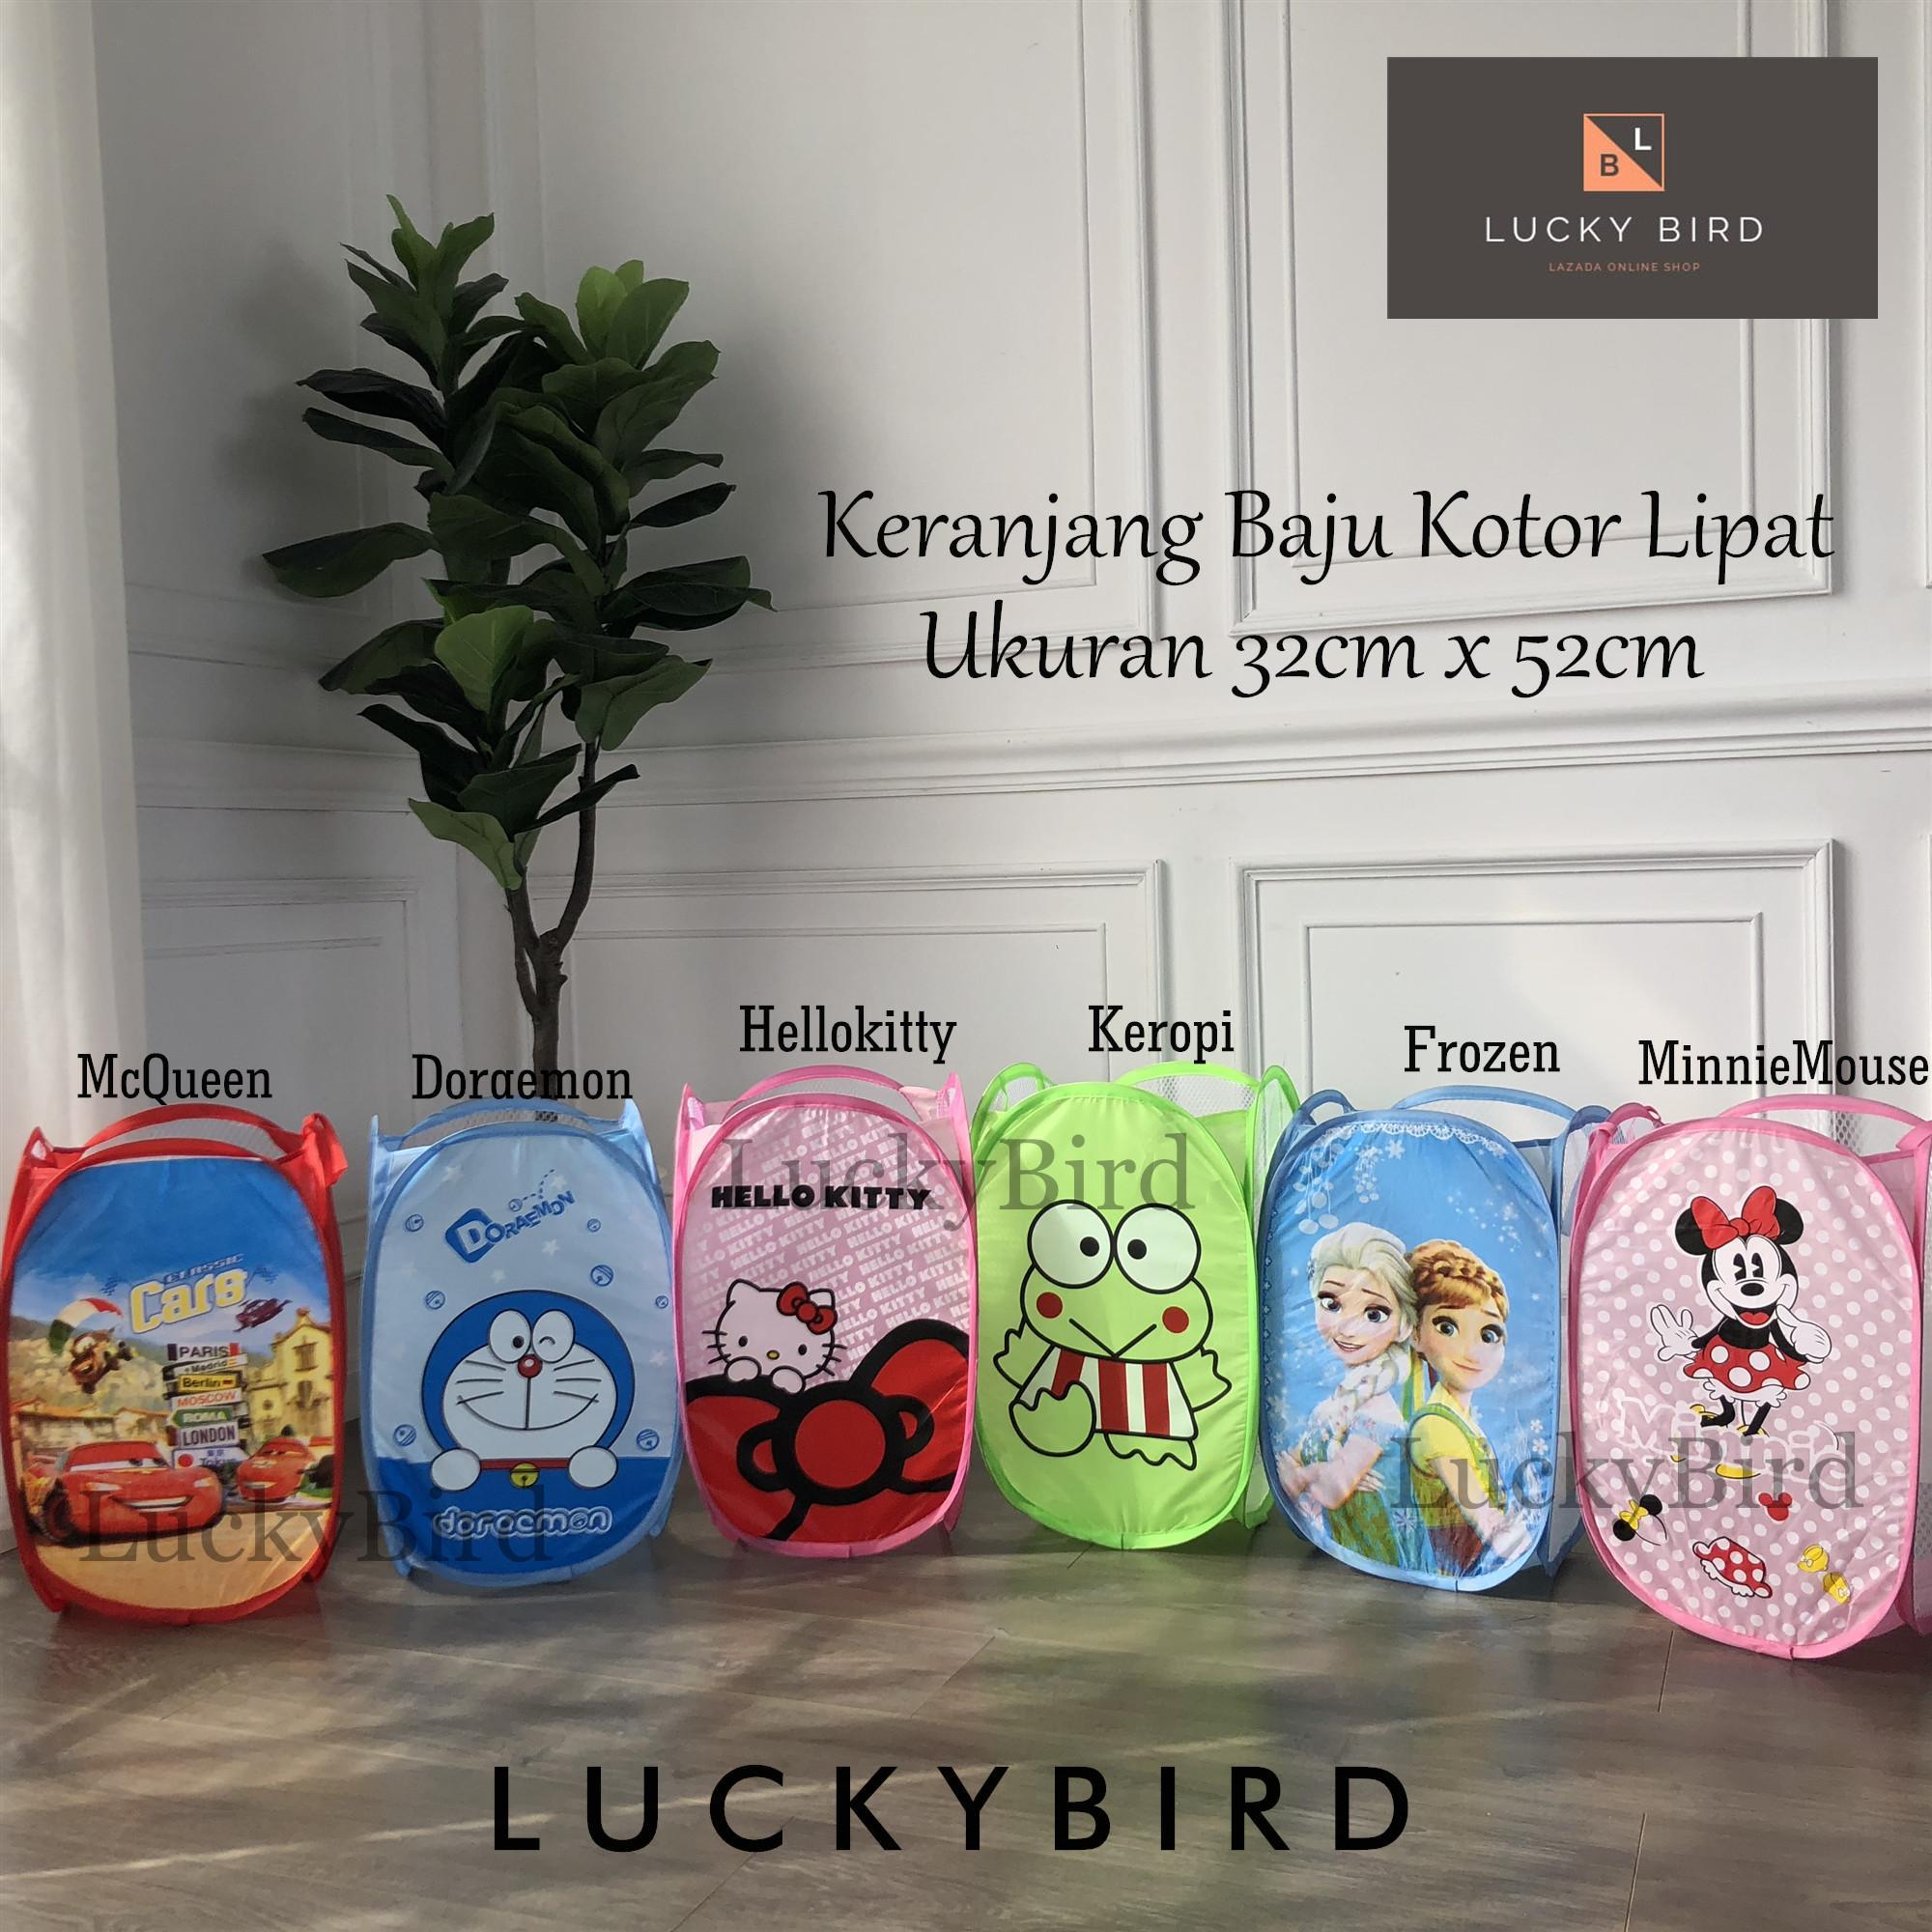 Keranjang Baju Kotor Karakter Lucu Keranjang Lipat Laundry Bag/ Binatu/ Hamper By Lucky Bird ...